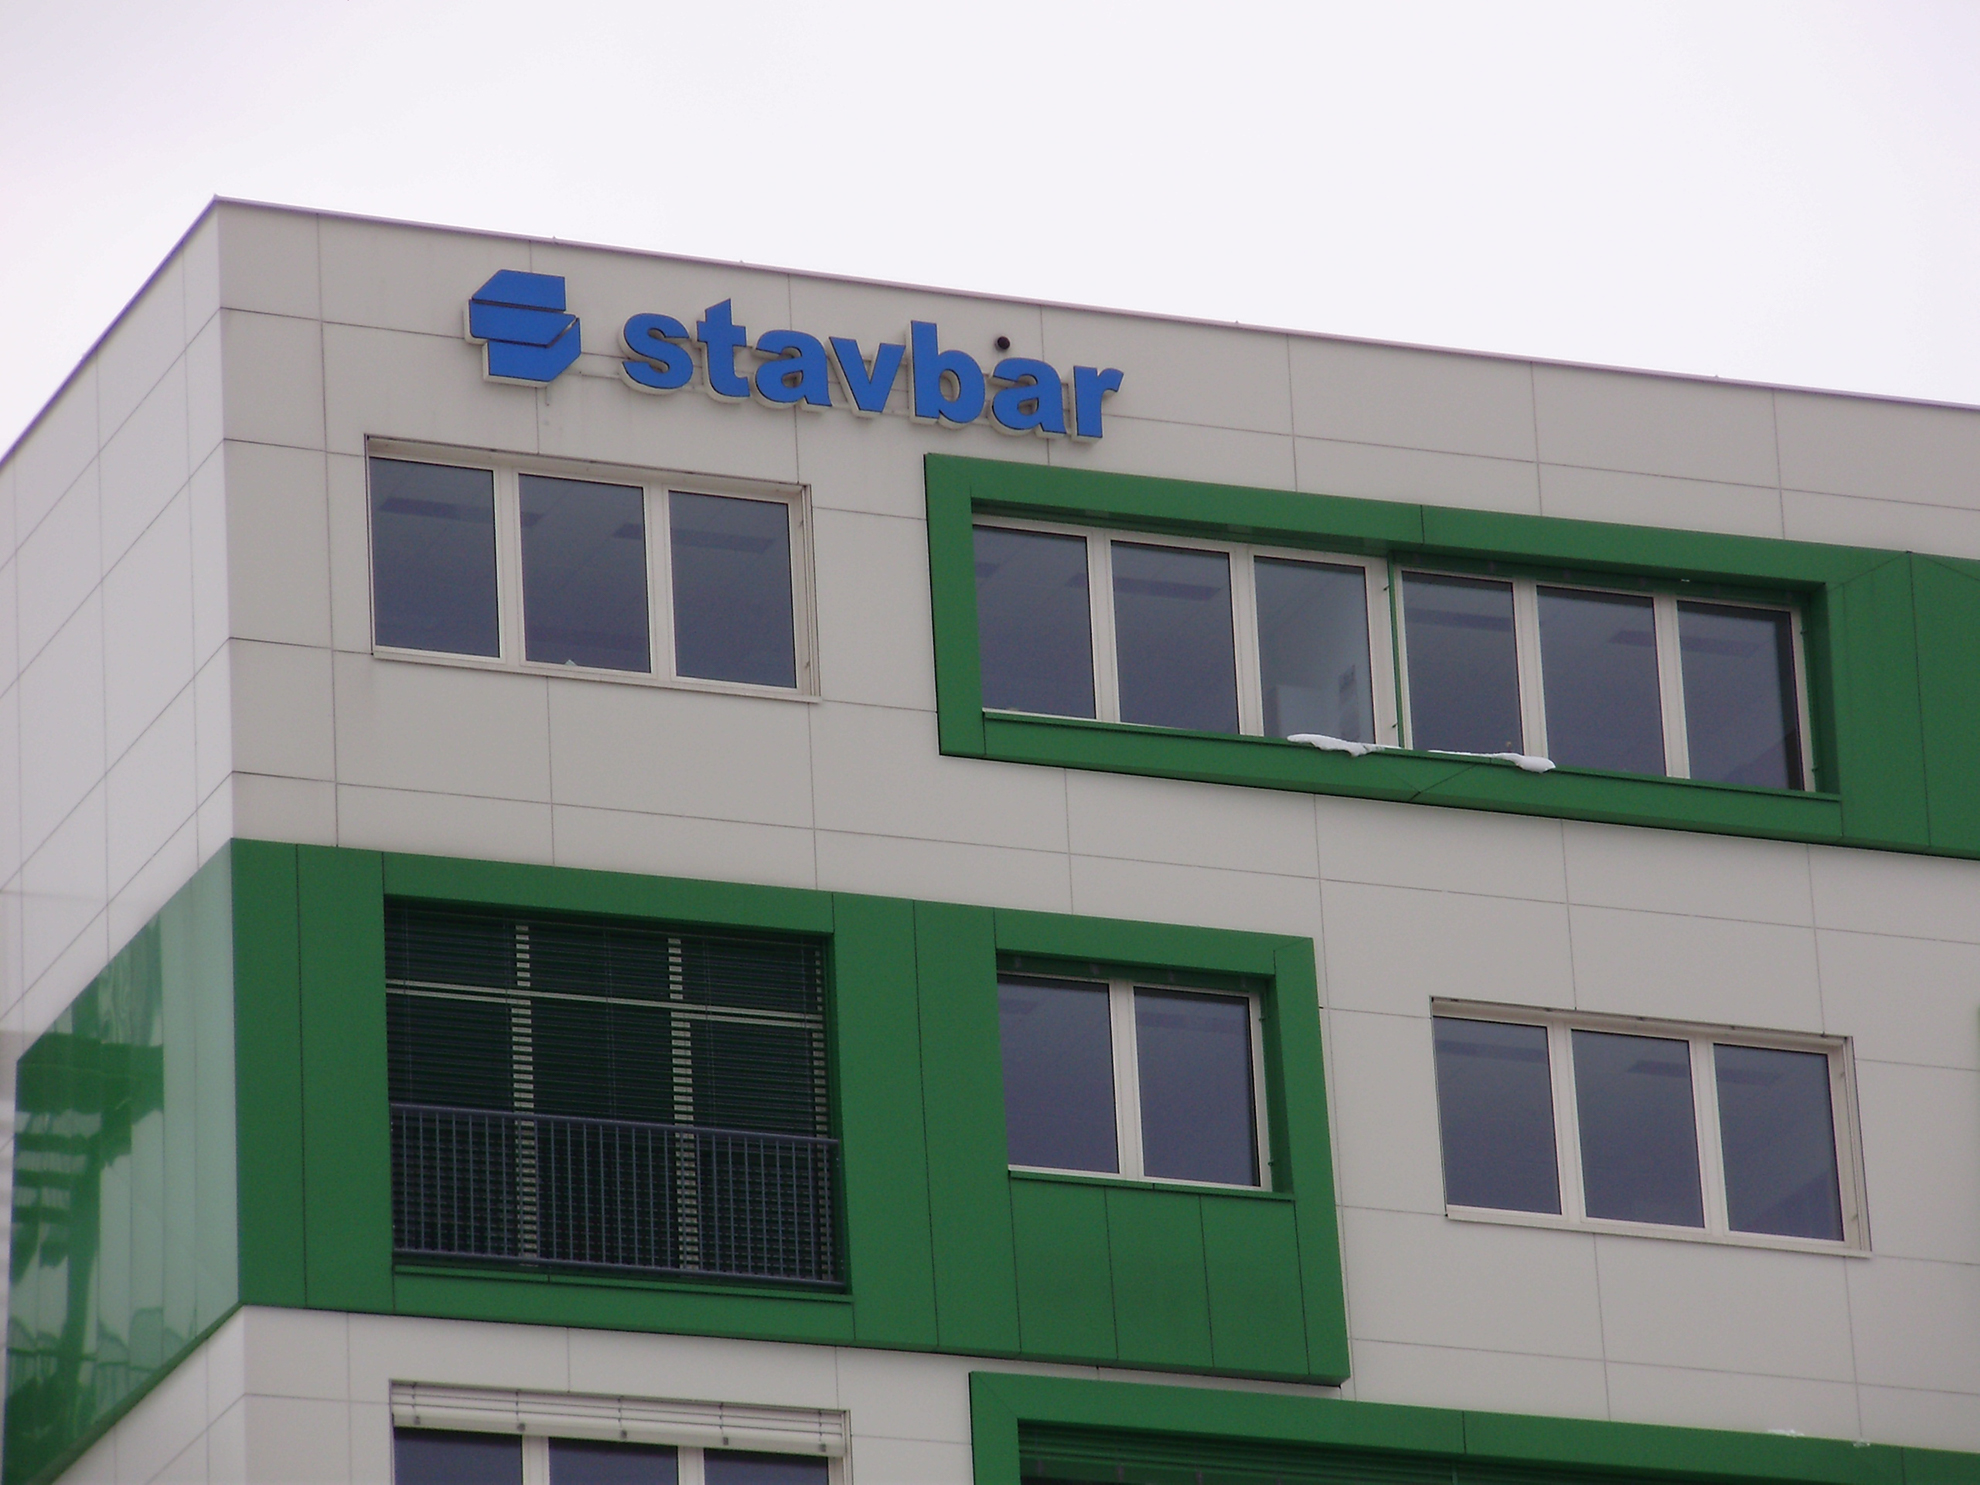 Edificio-Stavbar.-MAribor-Eslovenia.-larson-2_1585915279.jpg